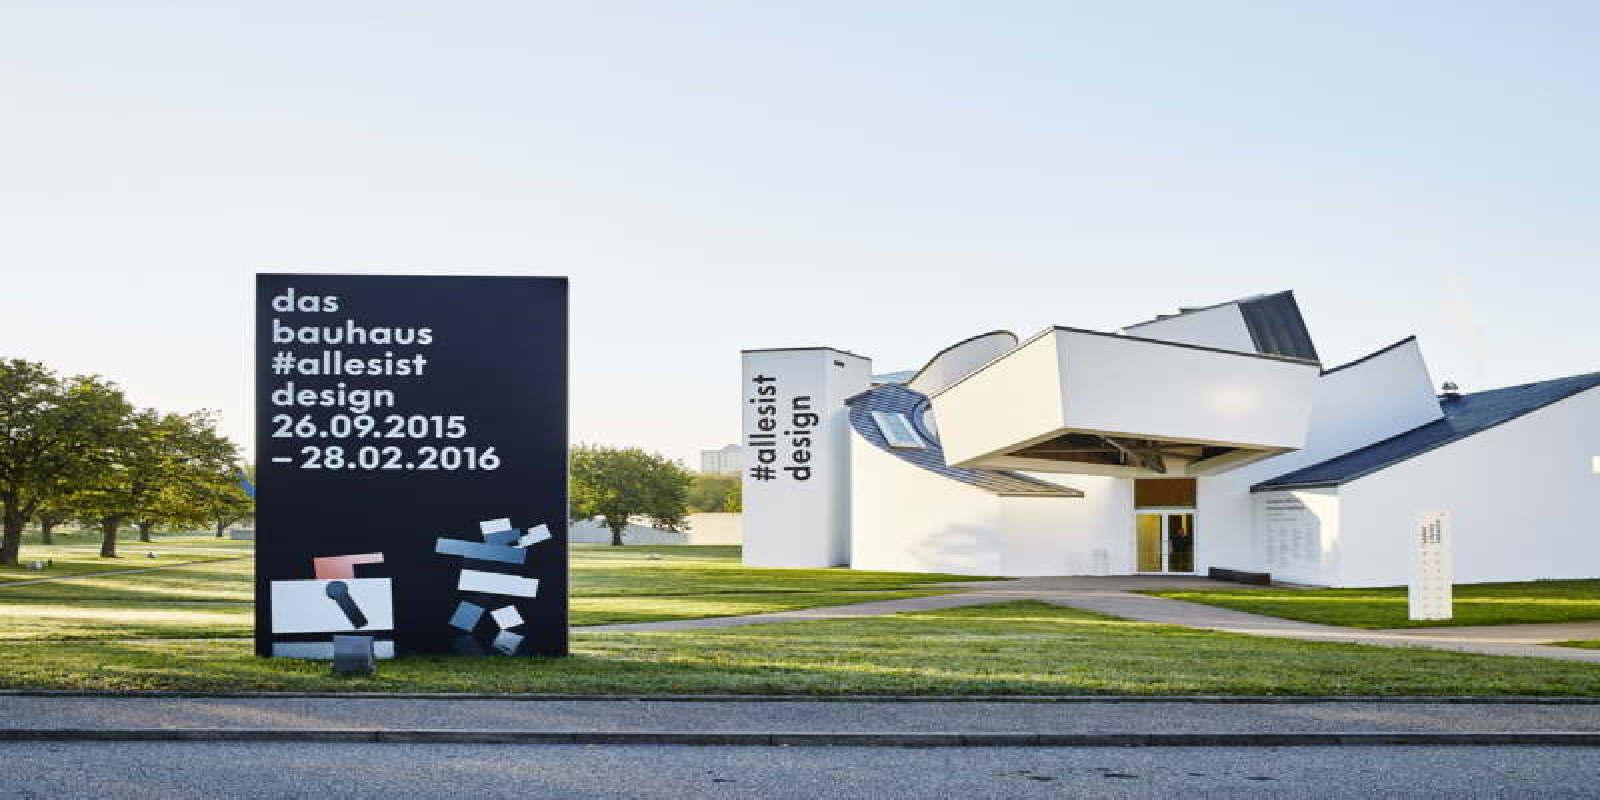 Vitra Design Museum The Bauhaus #itsalldesign exhibition | Floornature